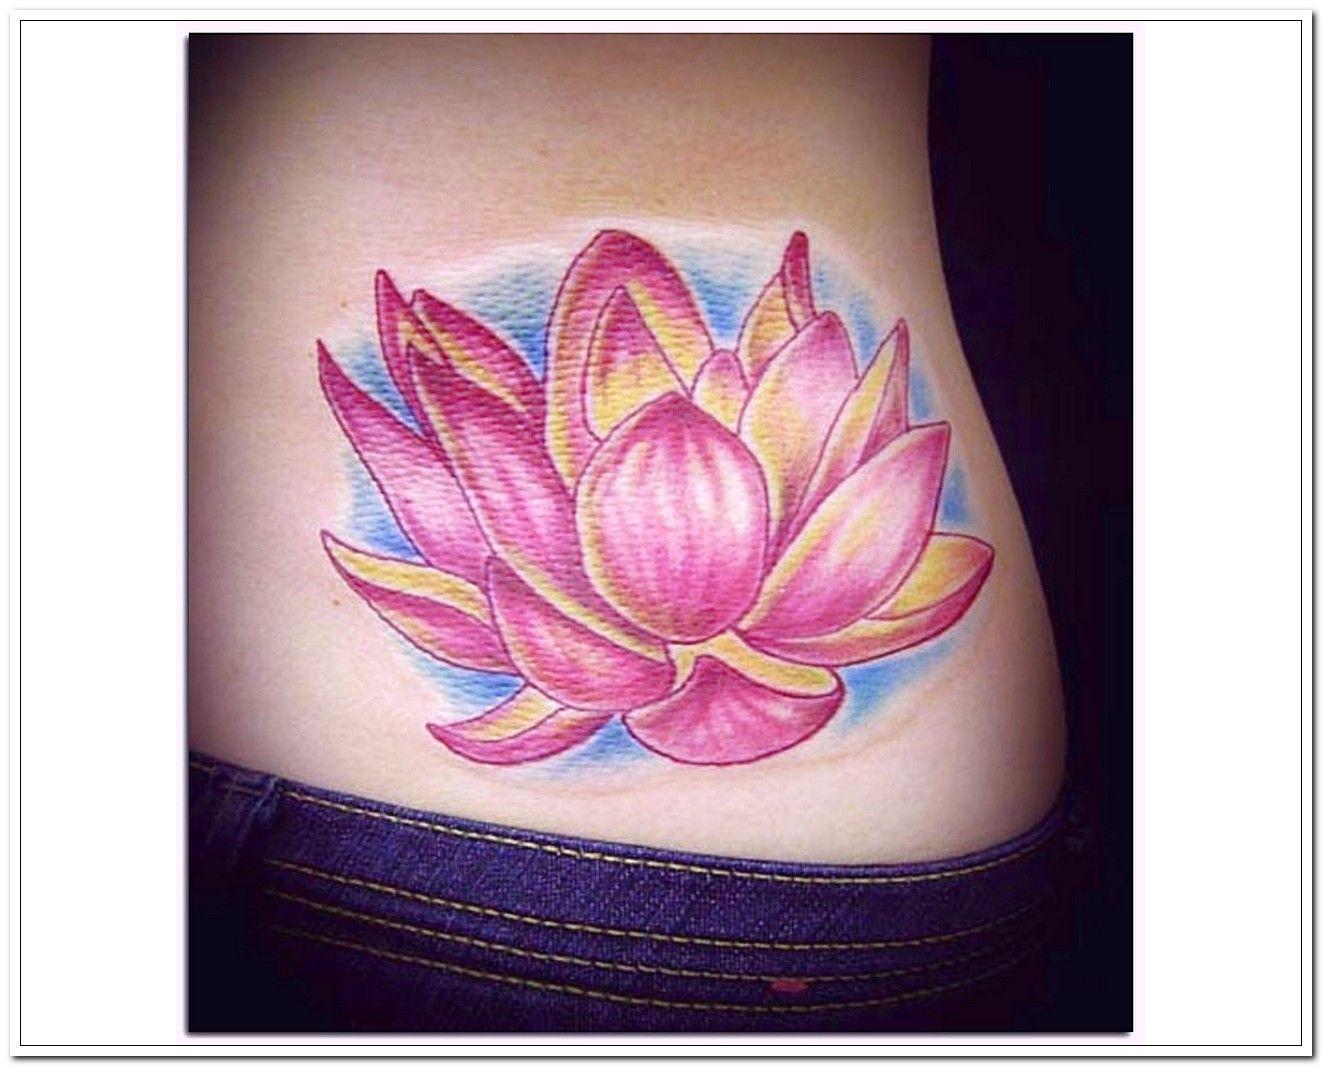 Nice lotus flower tattoo httpfreetattooideascategory nice lotus flower tattoo httpfreetattooideascategory izmirmasajfo Image collections